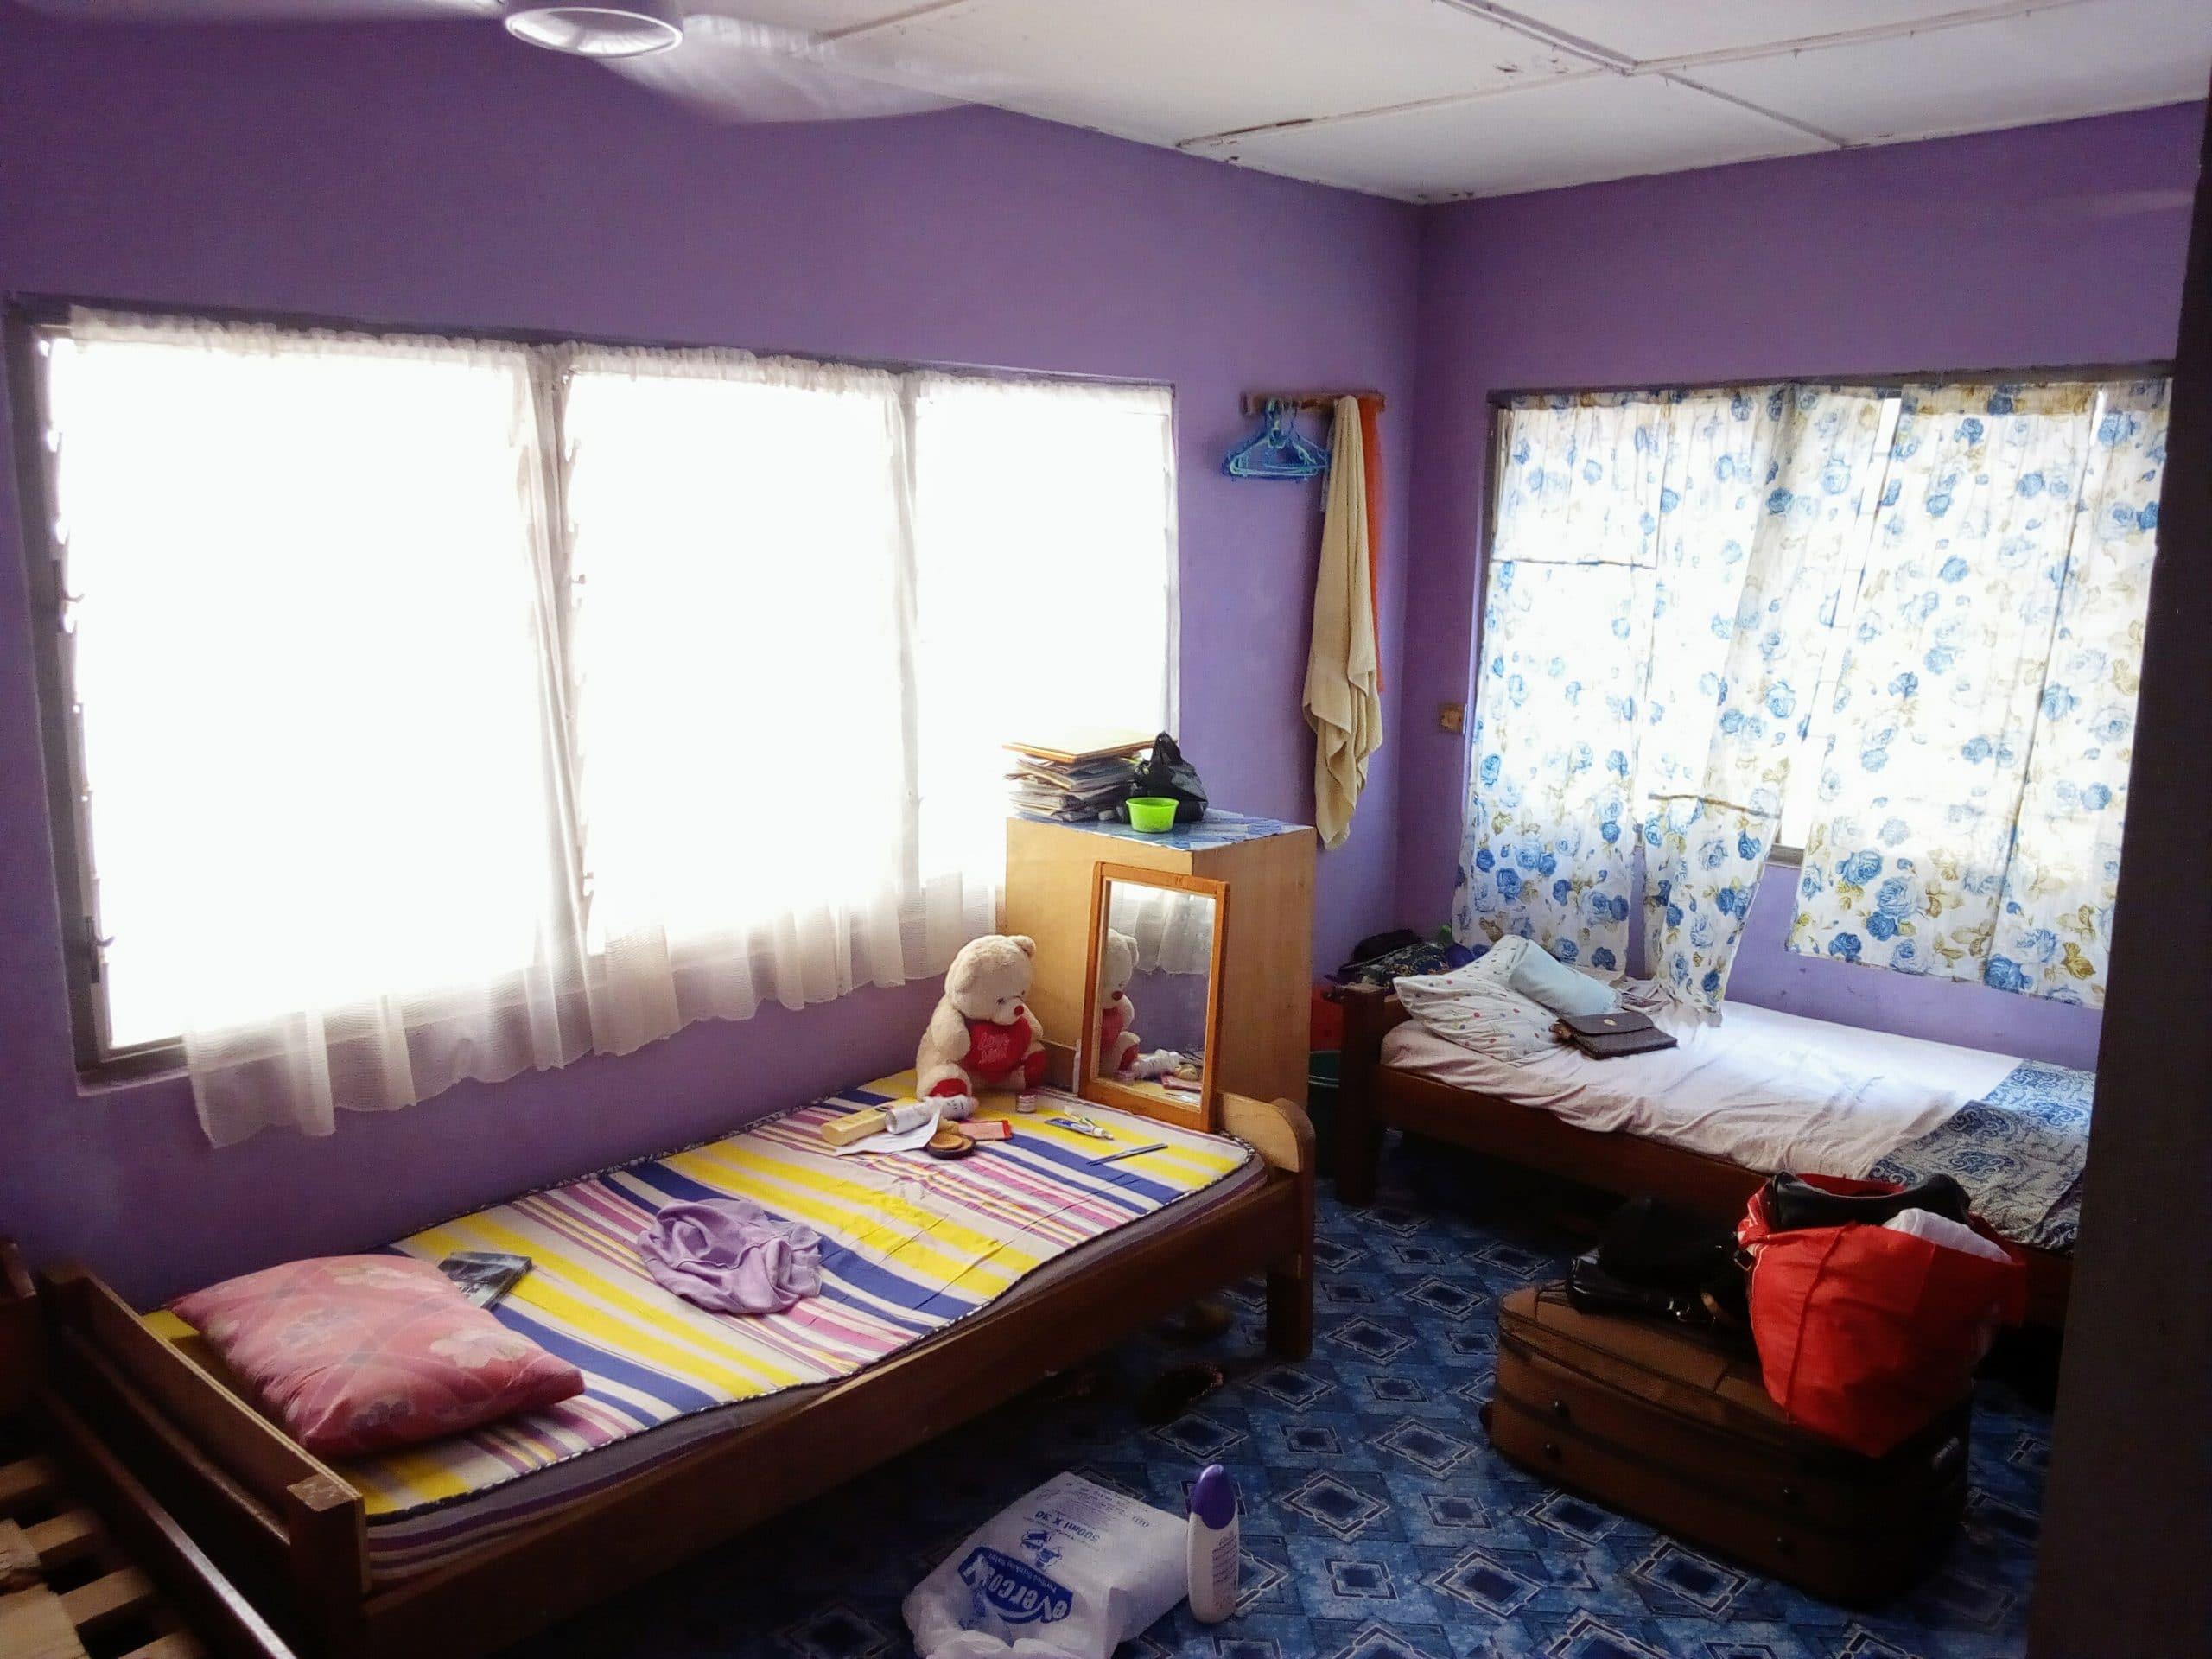 hostel accommodation at AIT ghana